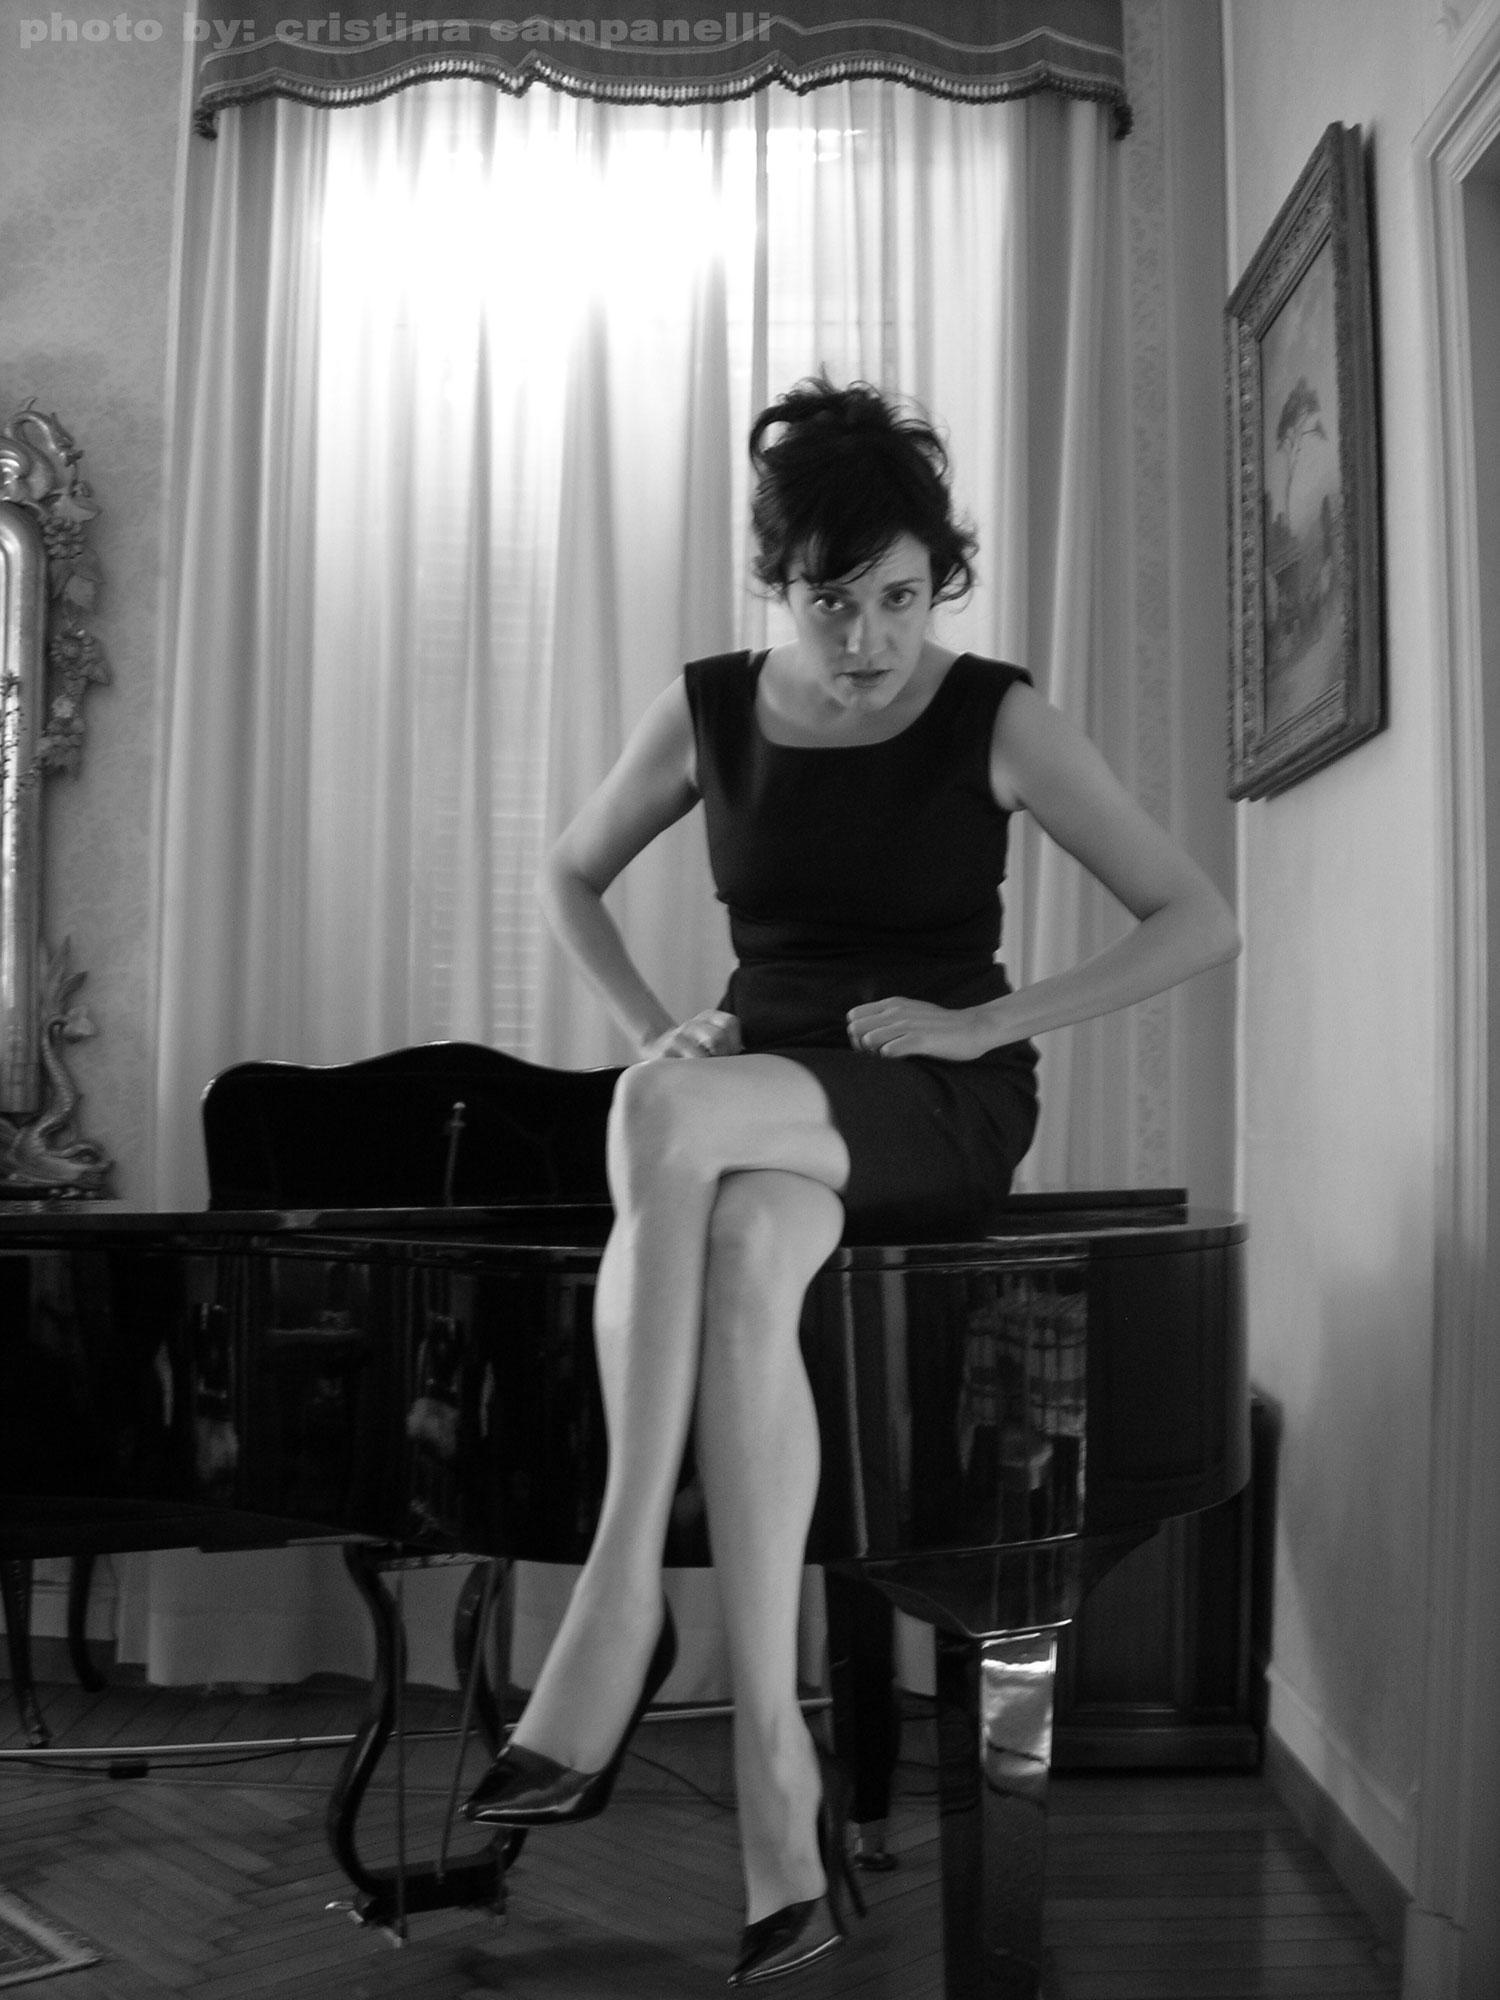 Coralina Cataldi-Tassoni photo by Cristina Campanelli (8).jpg